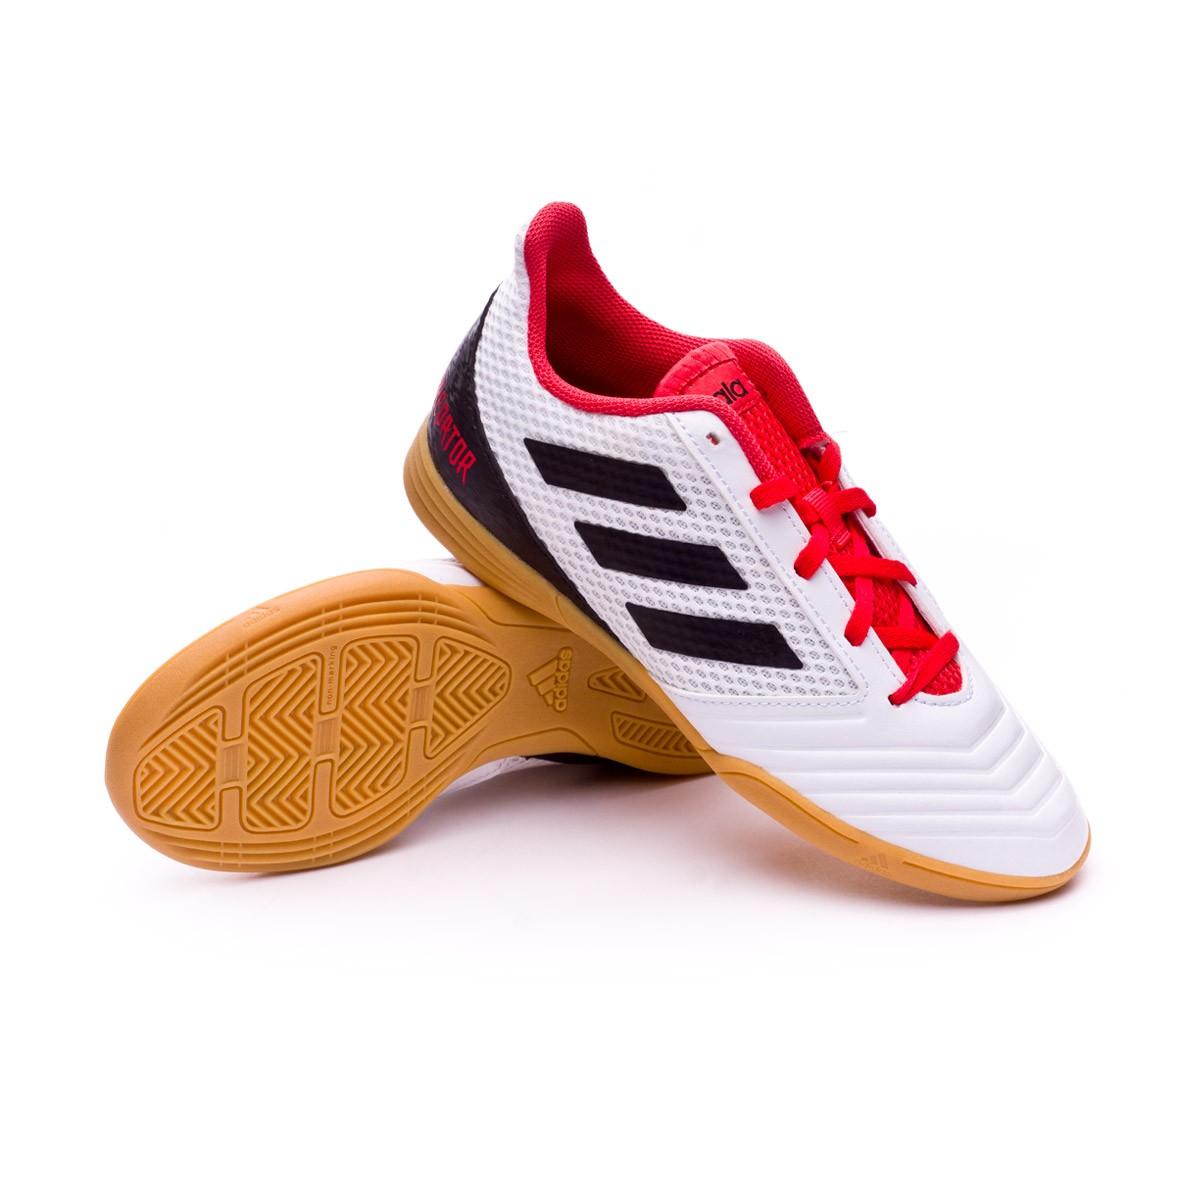 501f7955c3da3 Tenis adidas Predator Tango 18.4 Sala Niño White-Core black-Real coral -  Tienda de fútbol Fútbol Emotion